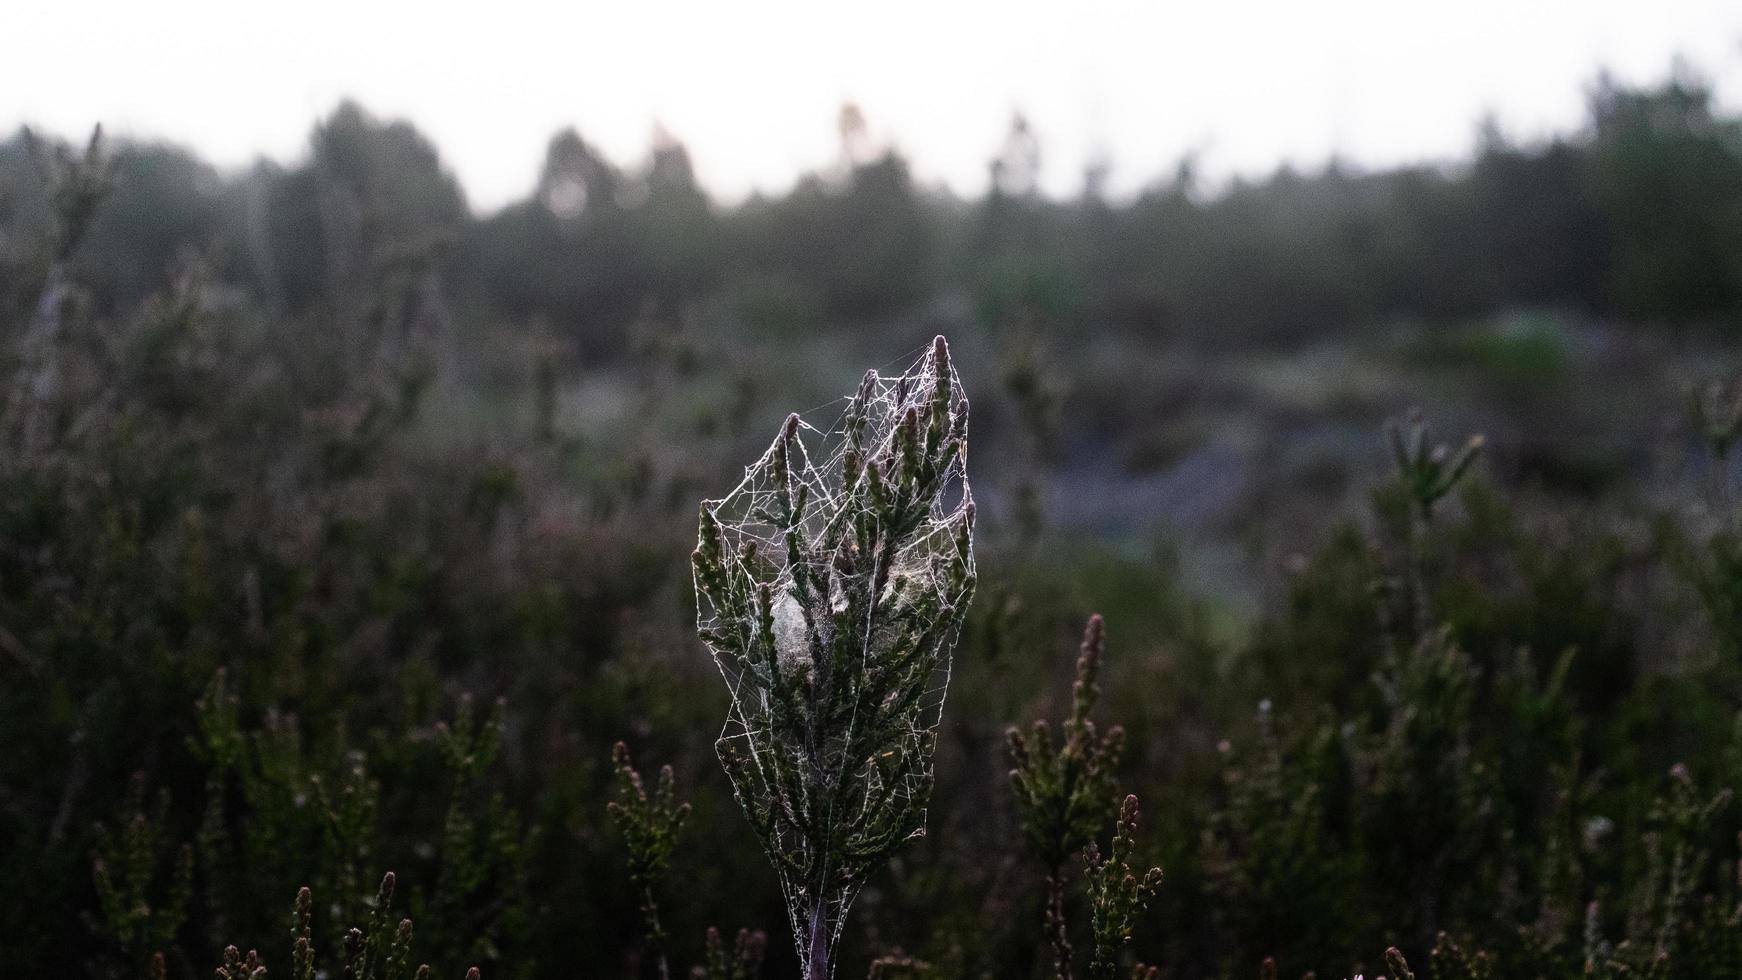 Plant with cobwebs photo